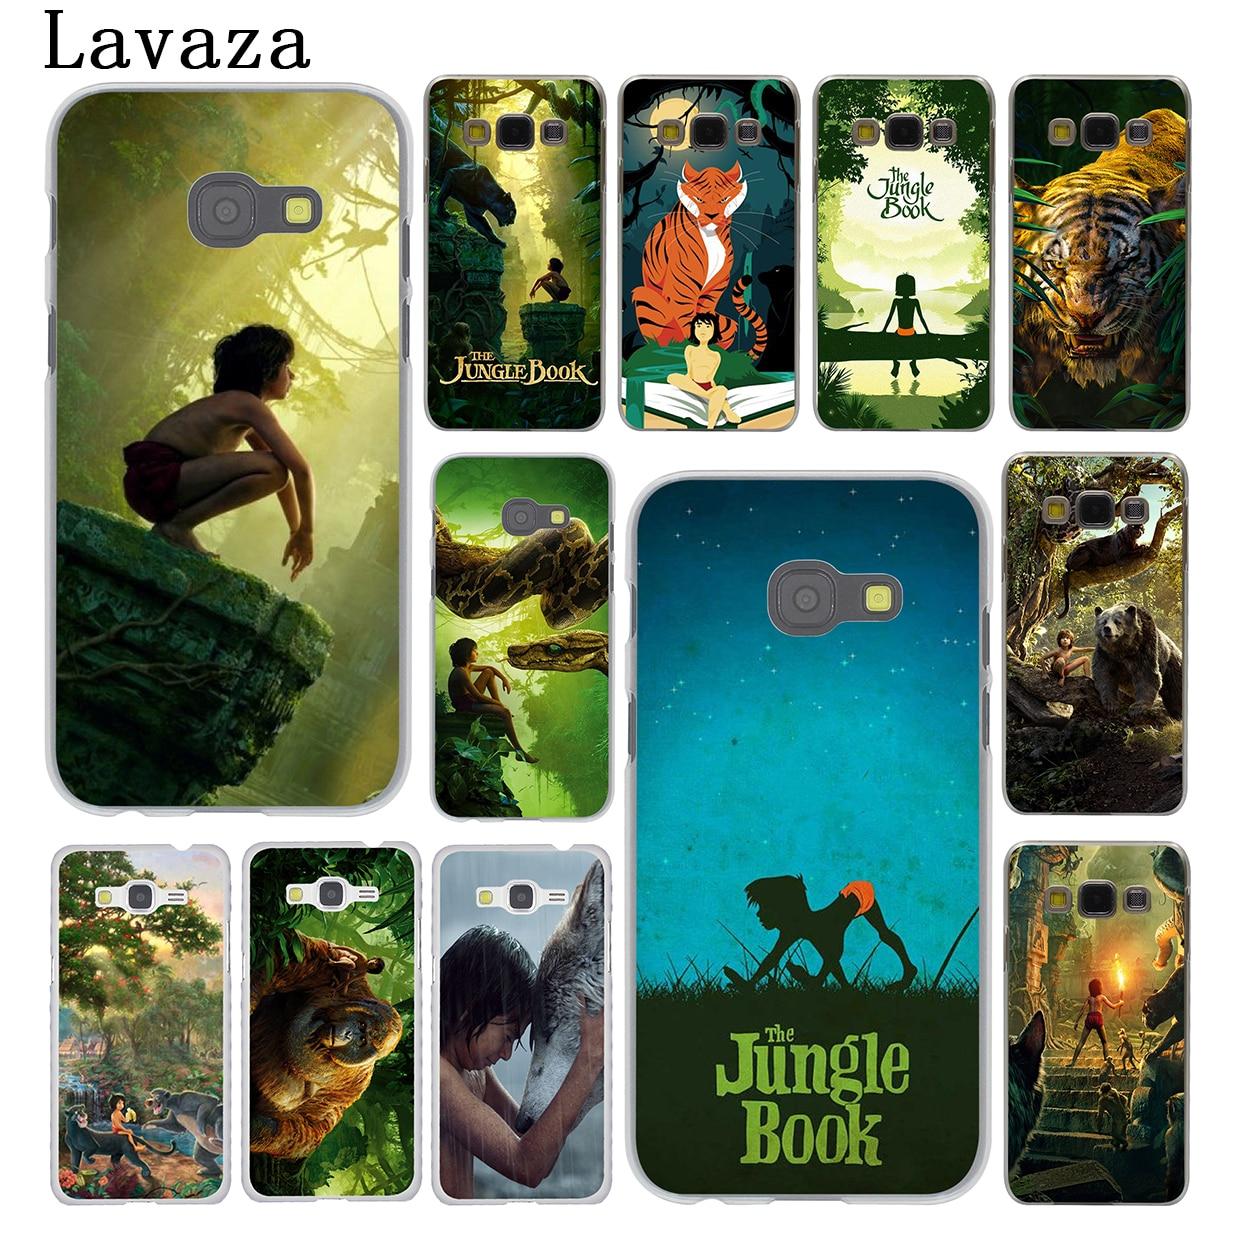 Lavaza The Jungle Book Hard Case for Samsung Galaxy A8 A7 A3 A5 2015 2016 2017 2018 Grand Prime Note 8 5 4 3 2 Cover